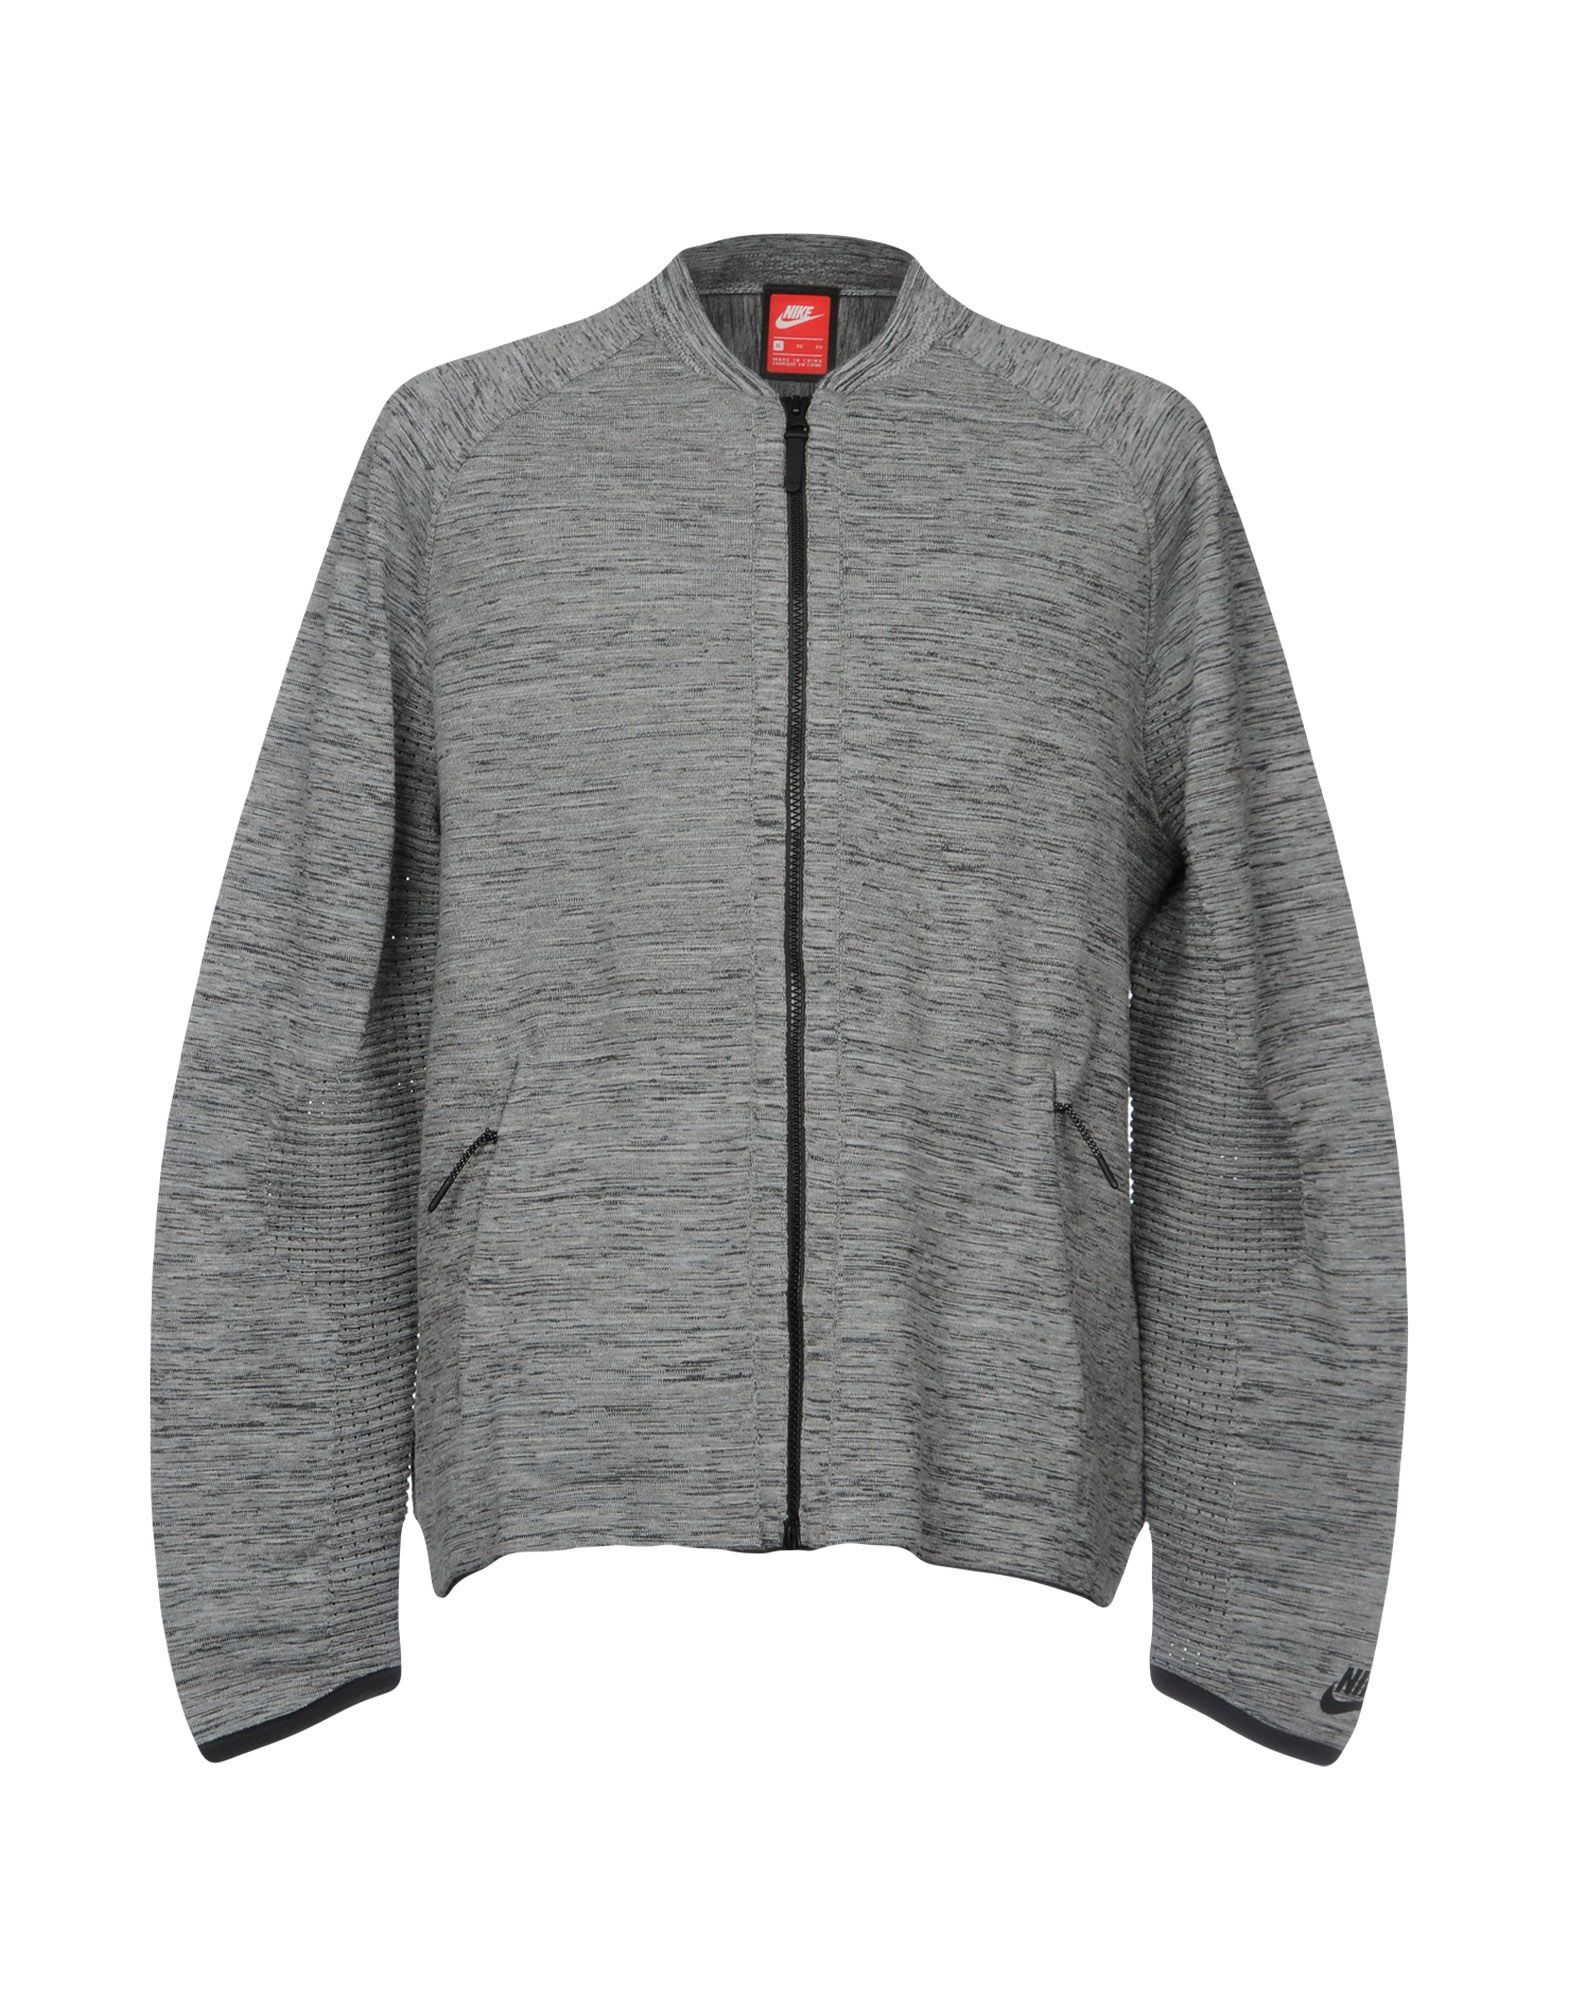 Cardigan Nike Uomo - Acquista online su